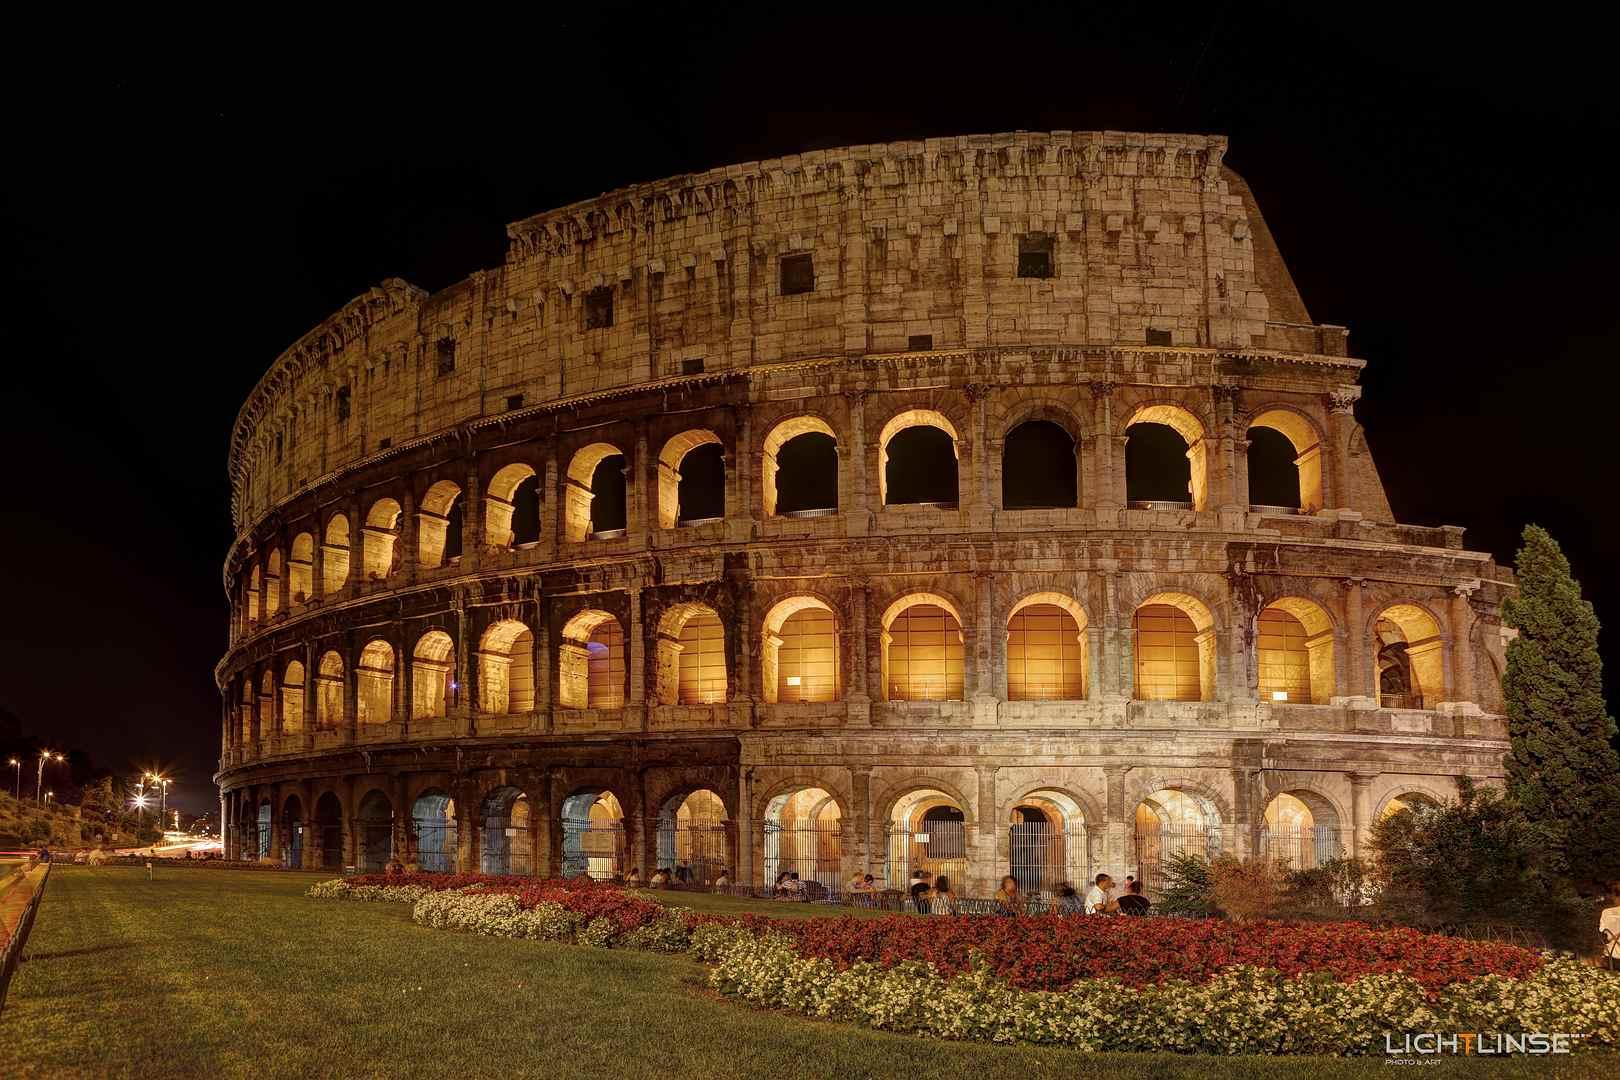 Aufnahme Colosseum in HDR Technik